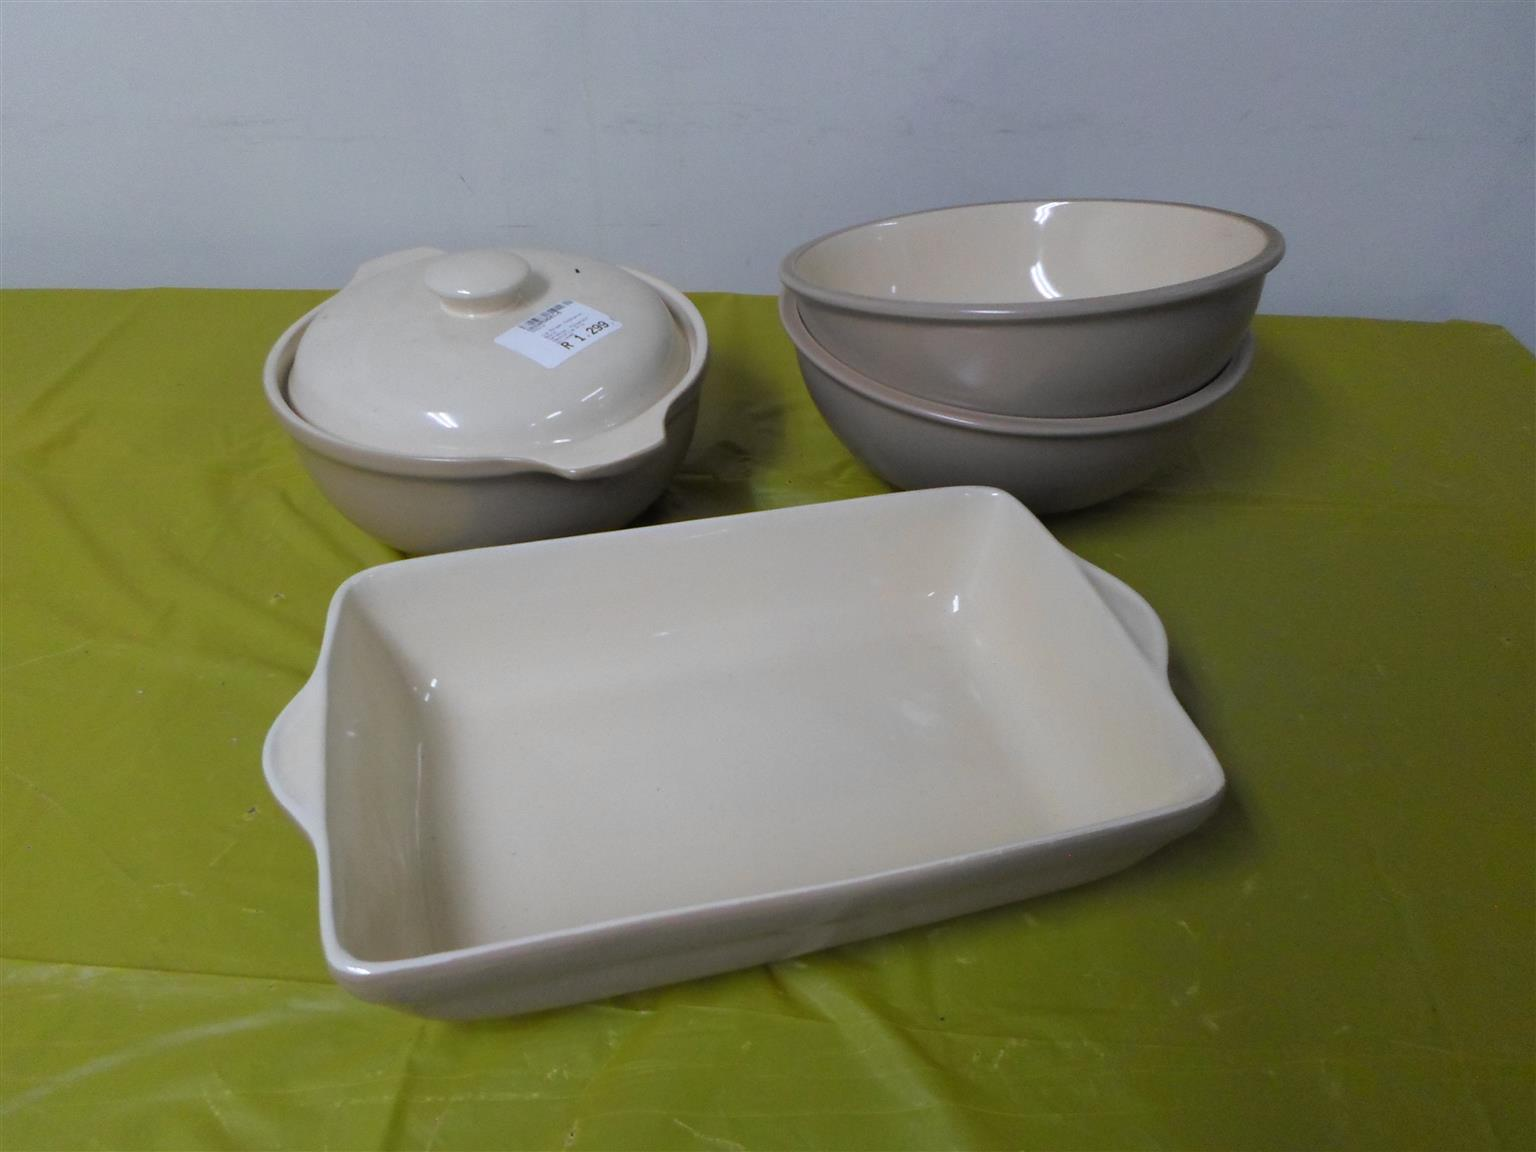 Le Morgan Cookware Set